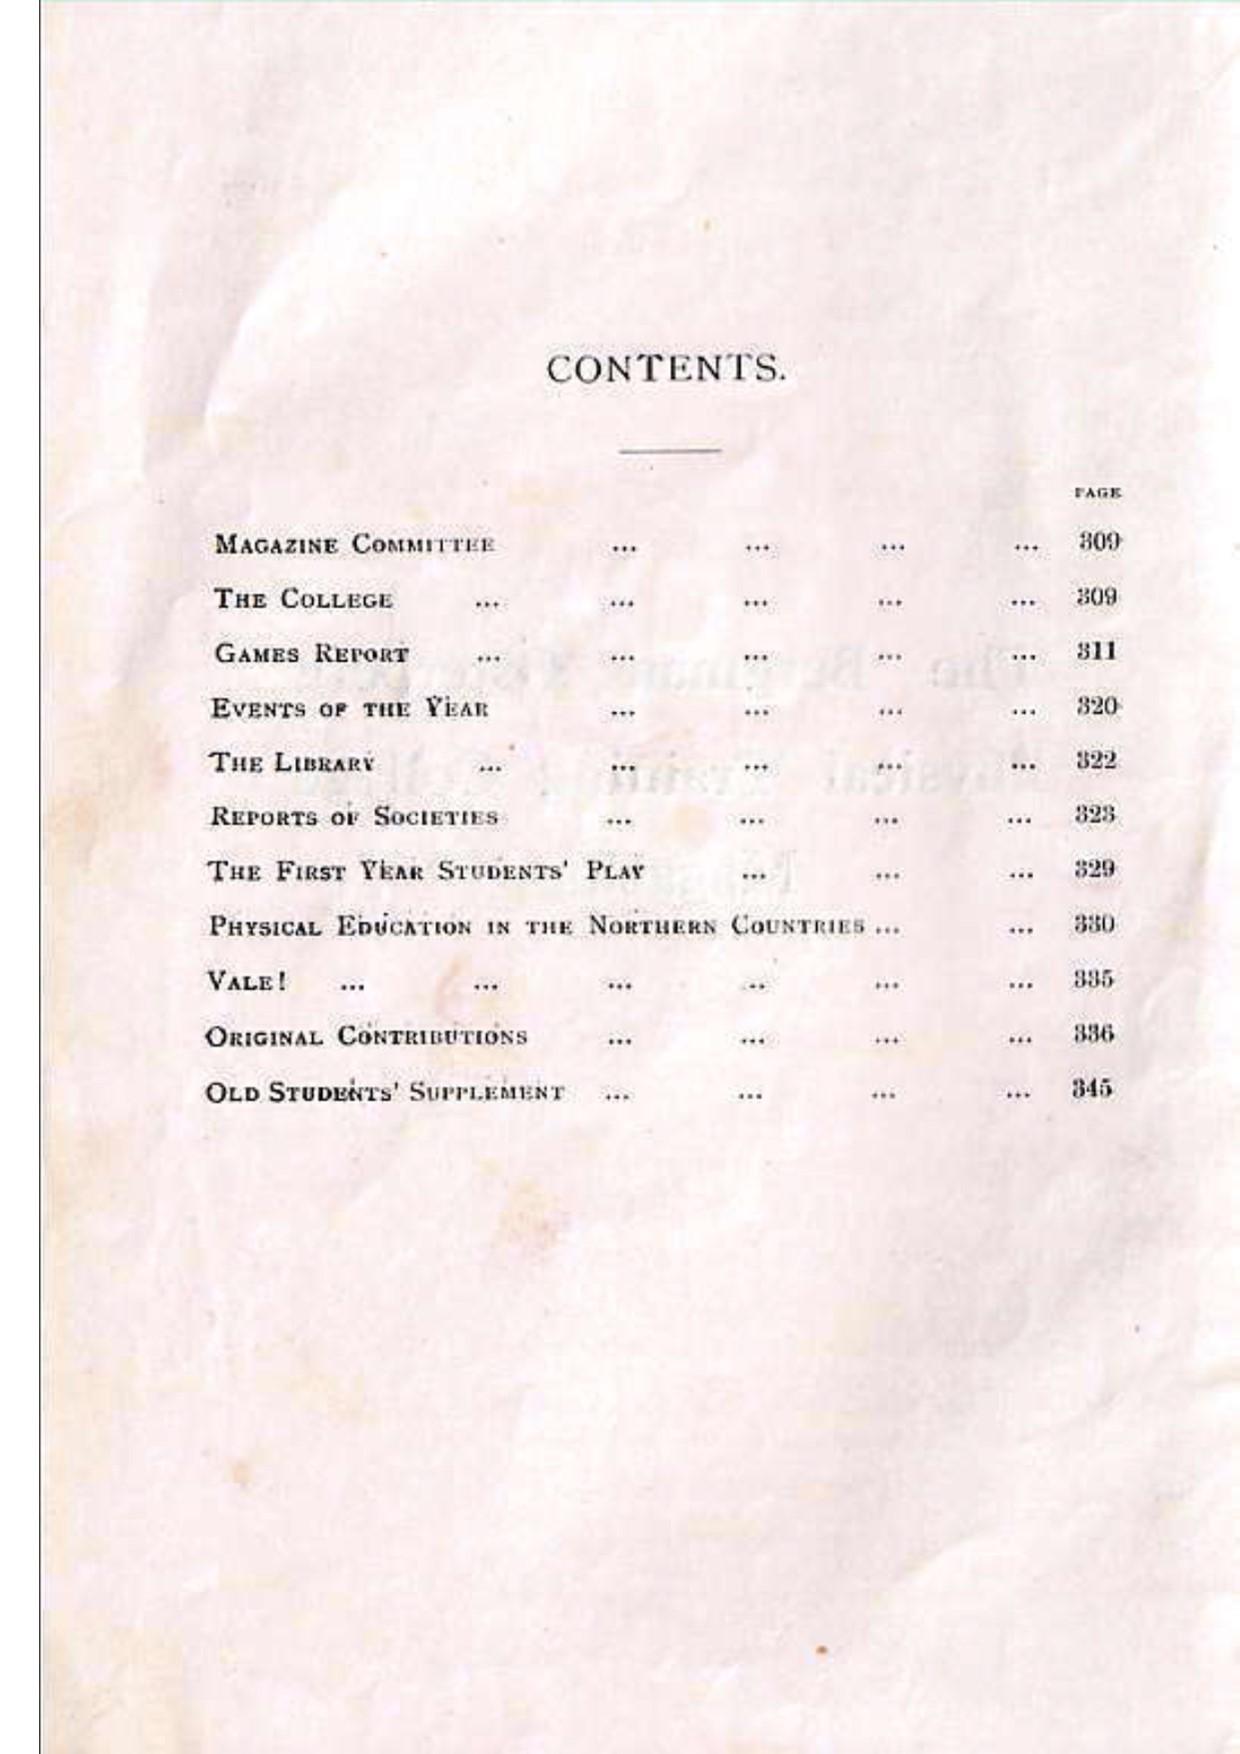 BOPTC 1928 Contents